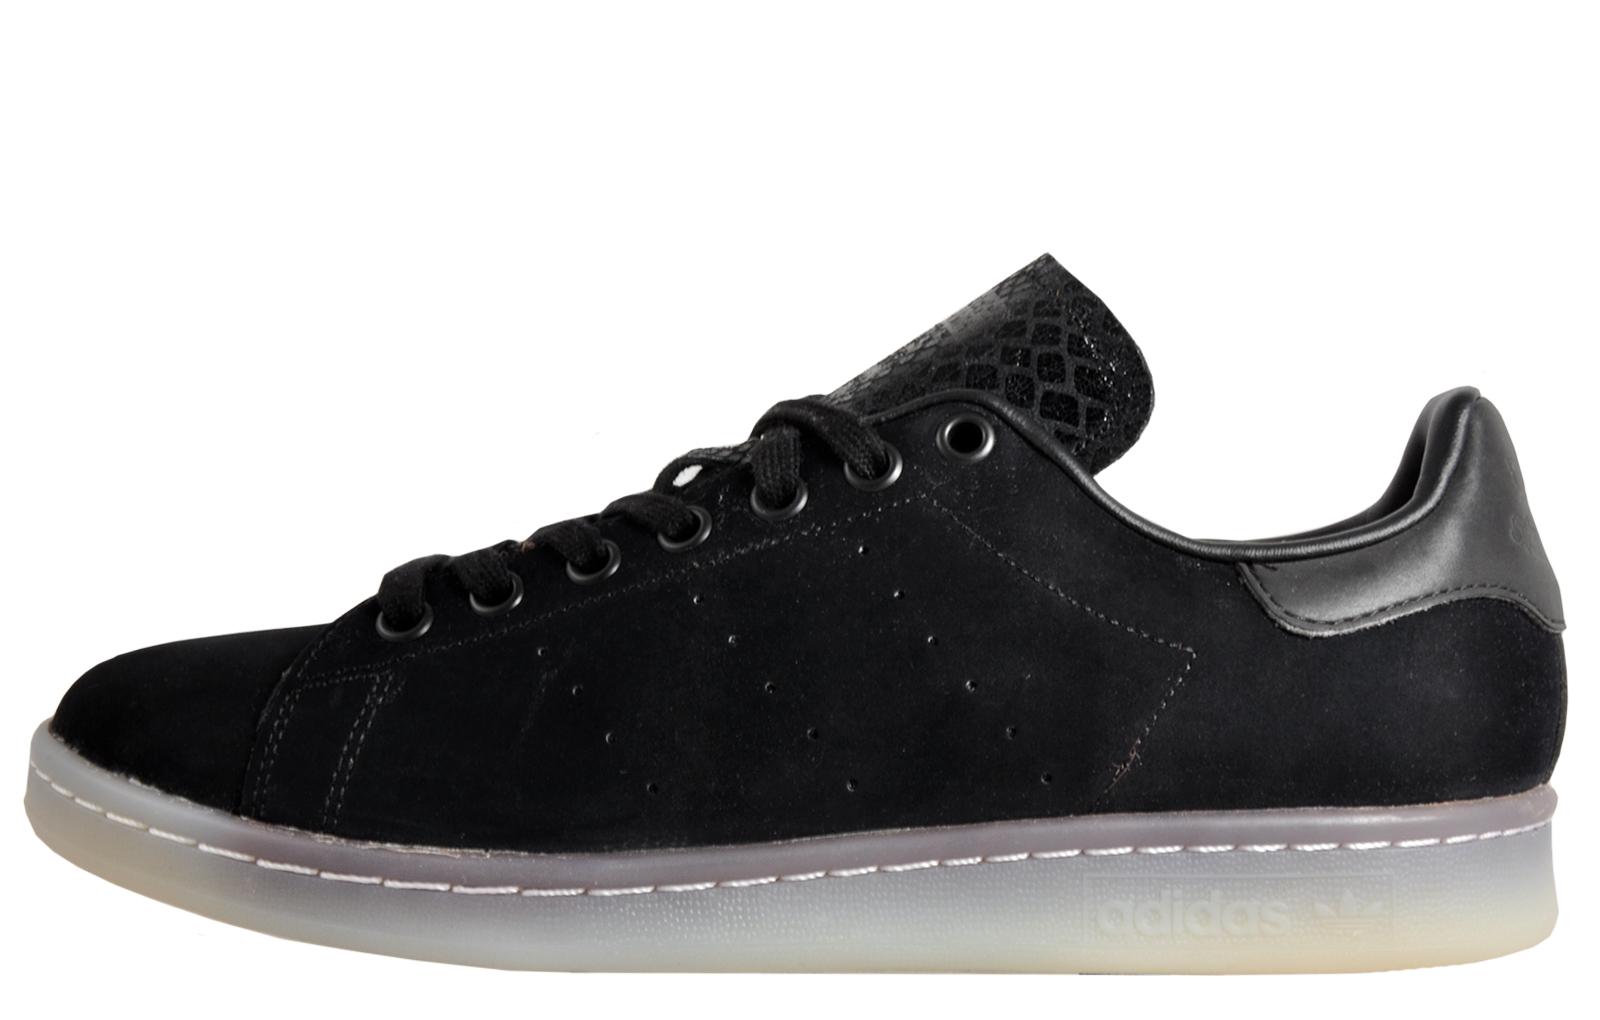 sale retailer 3bc8e b85f5 Adidas Originals Stan Smith Mens Classic Casual Retro Trainers B Grade Black